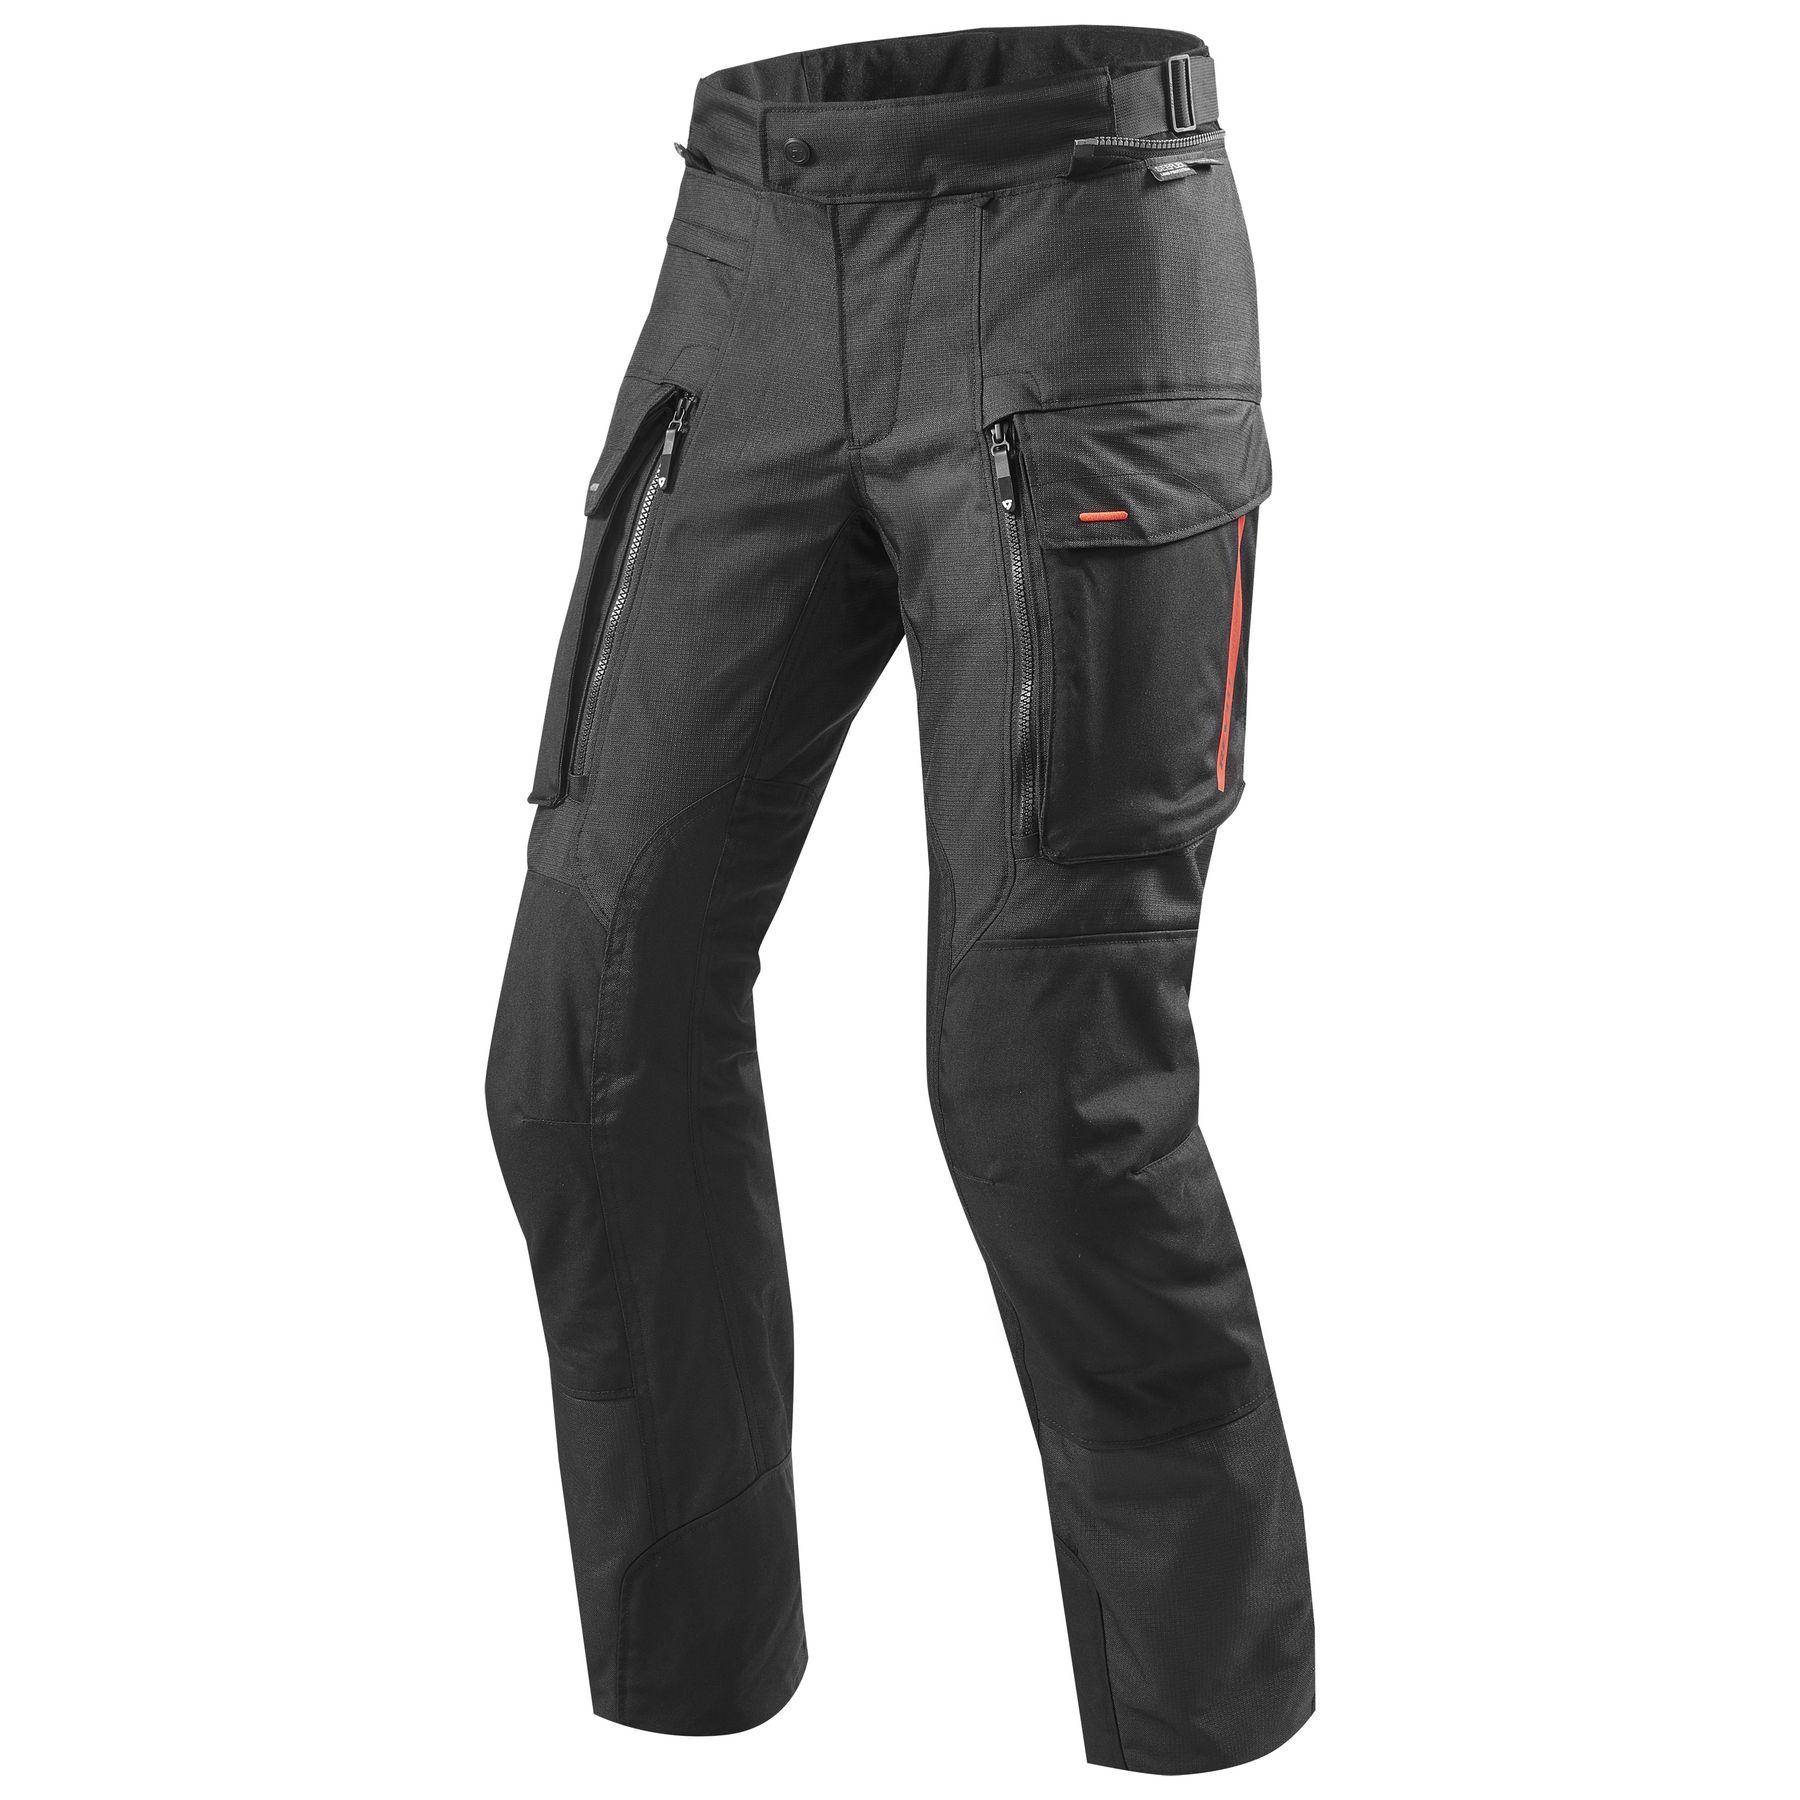 Revit Sand 3 Motosiklet Pantolonu